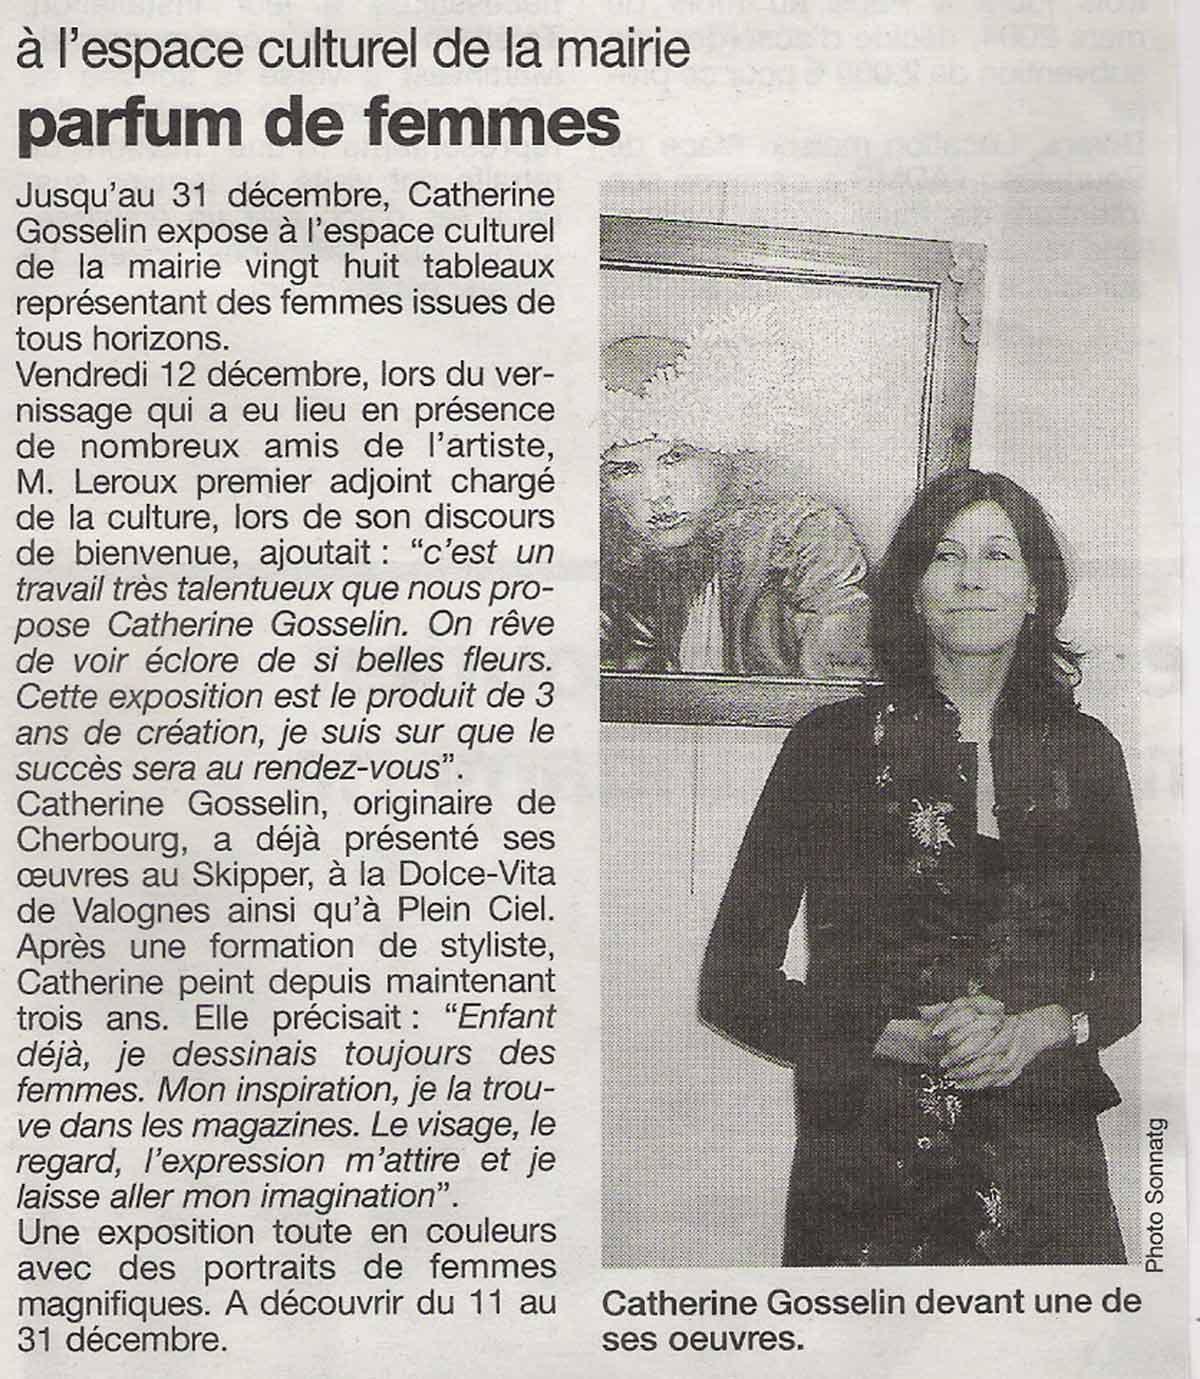 article-parfom-de-femme-200.jpg